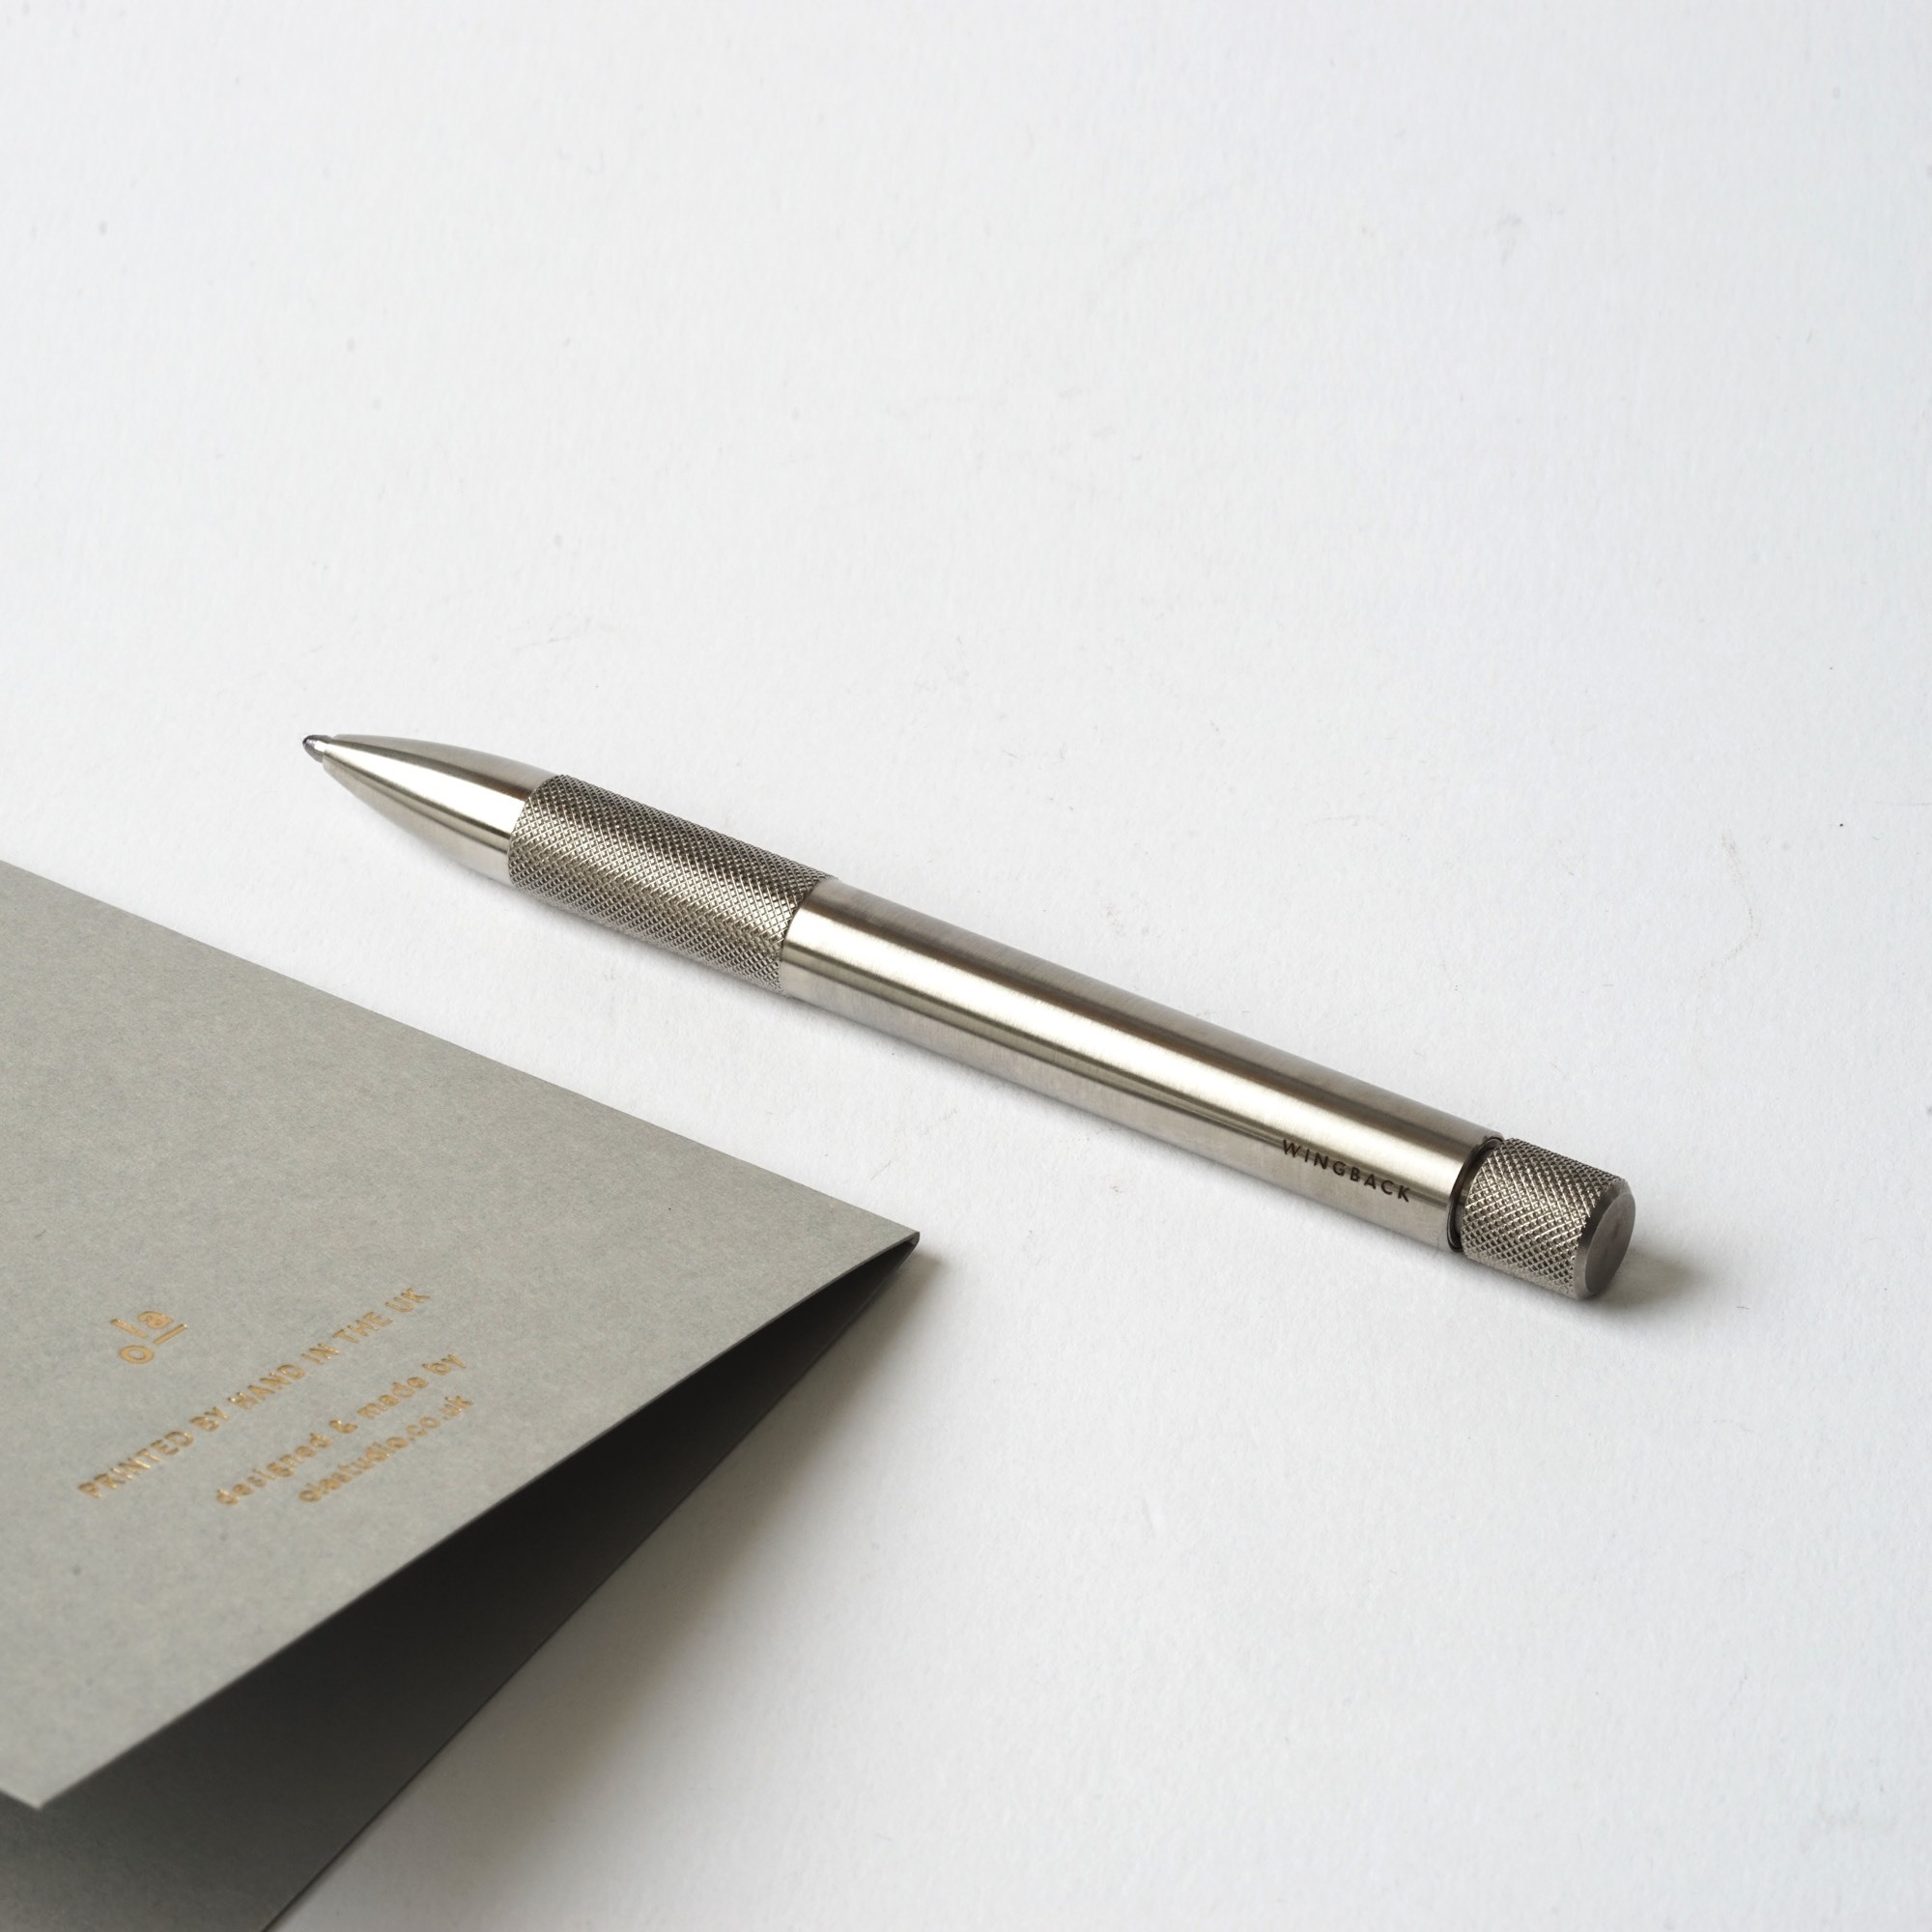 Wingback Компактная ручка Mechanical Pen: сталь